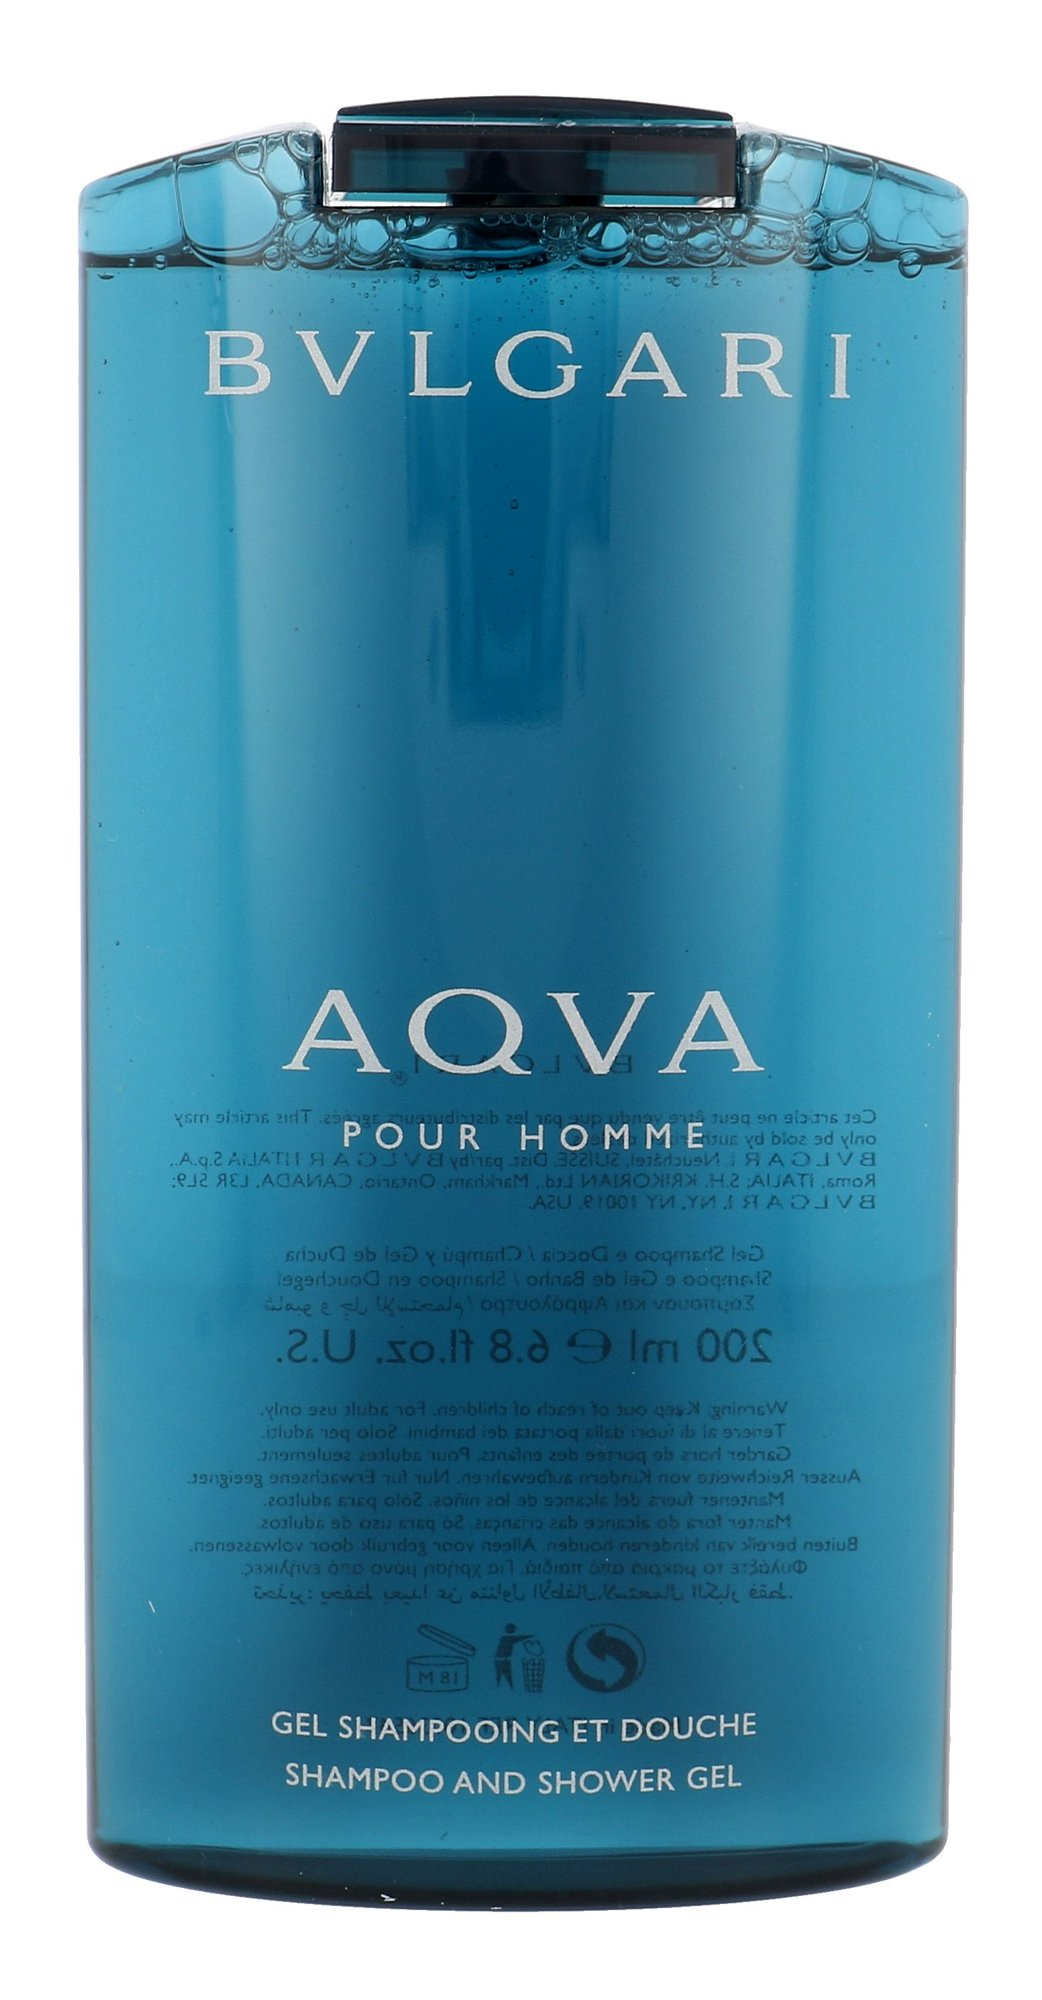 Bvlgari Aqva Pour Homme Shower gel 200ml